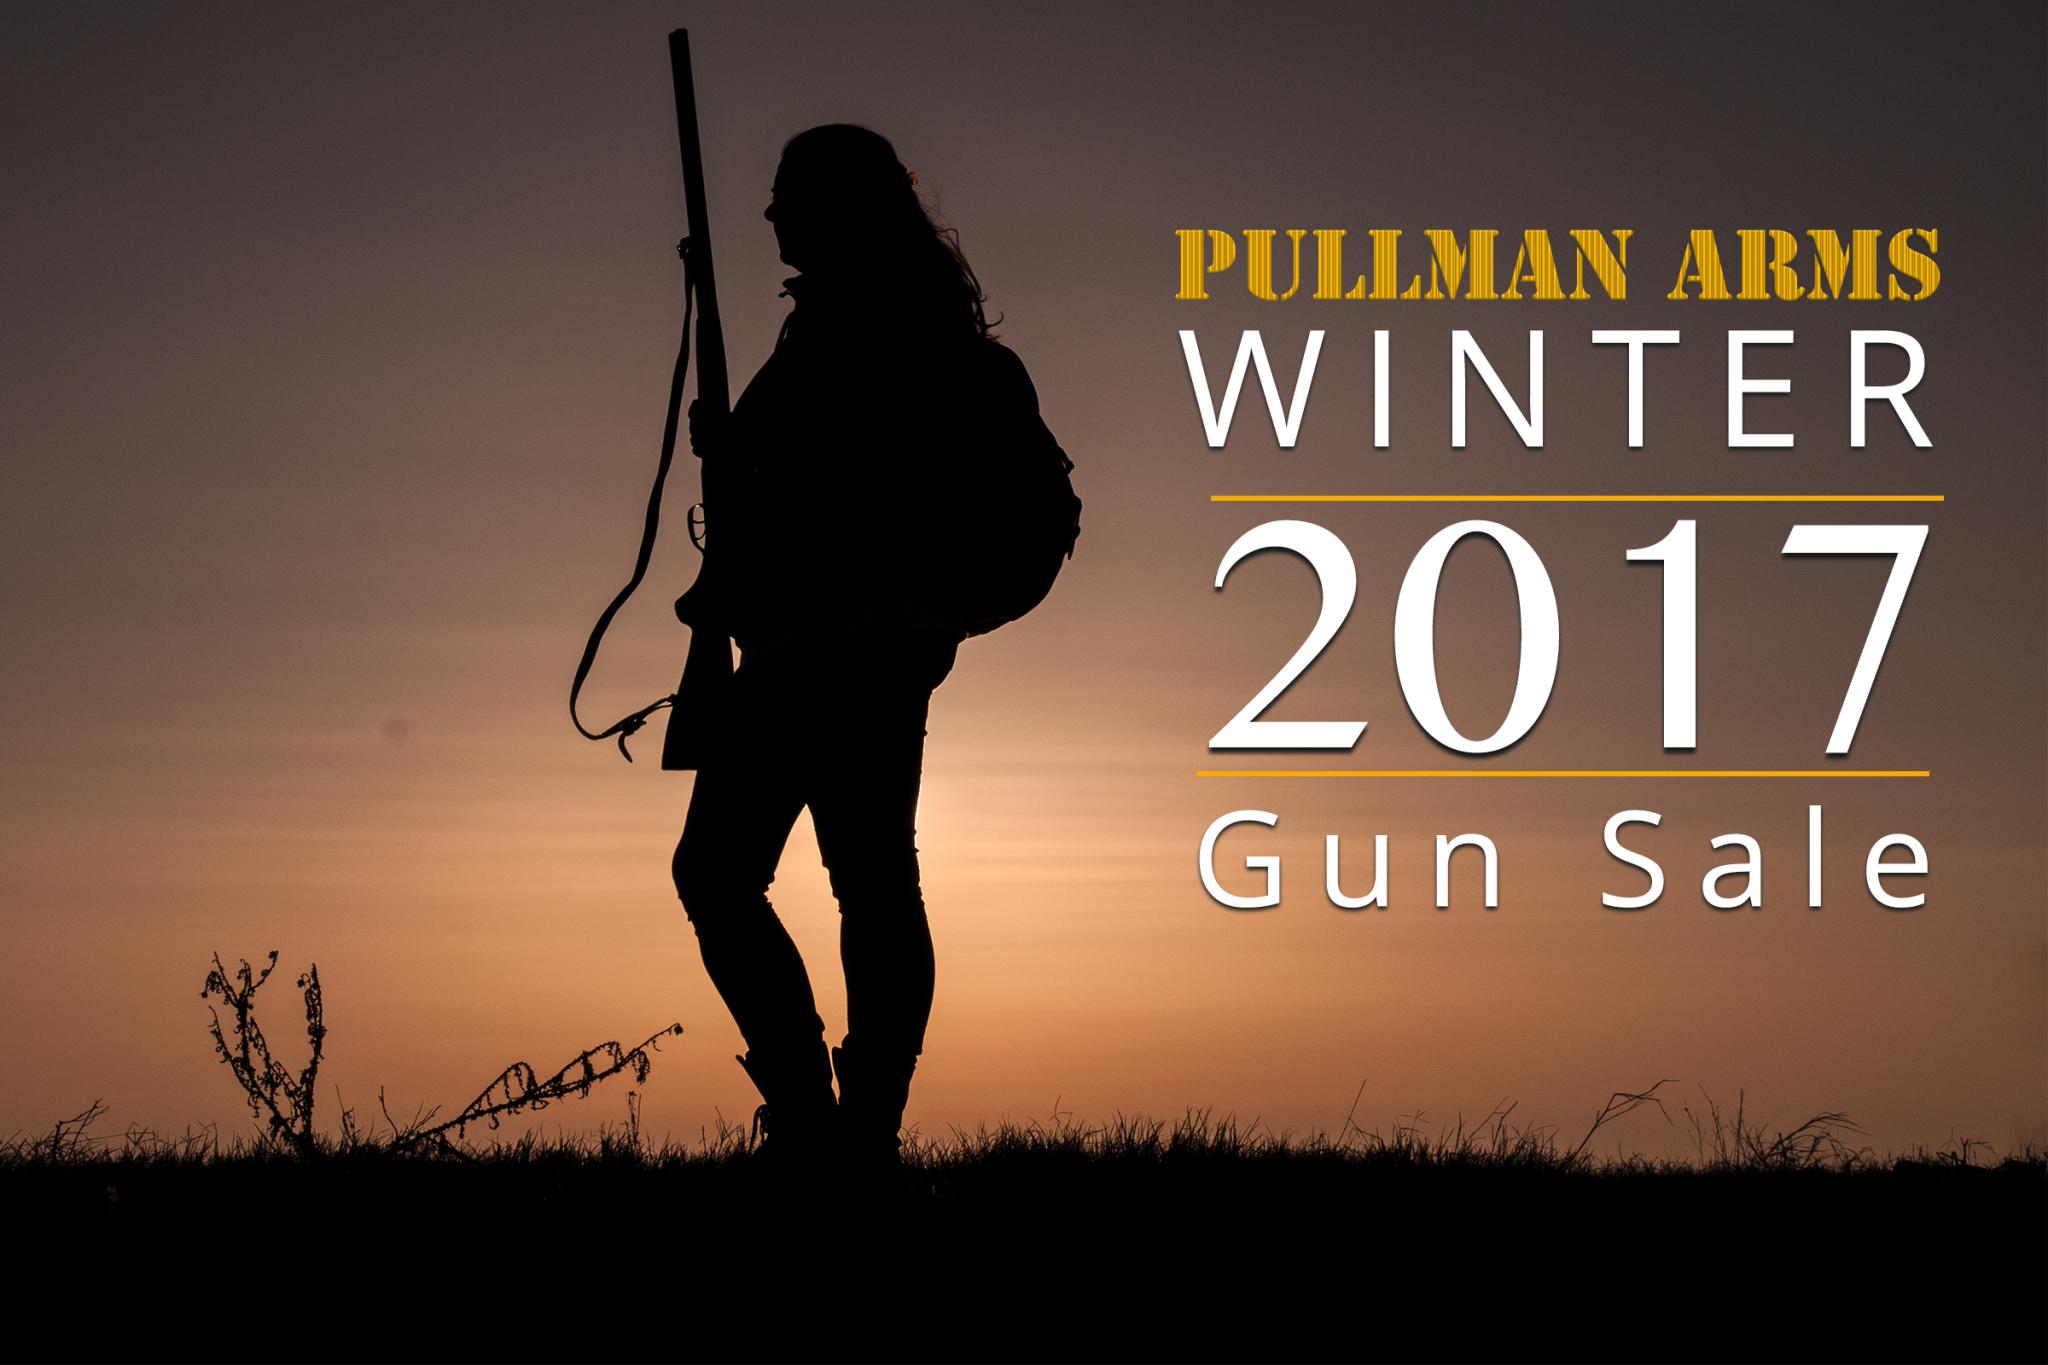 Pullman Arms Winter 2017 Gun Sale